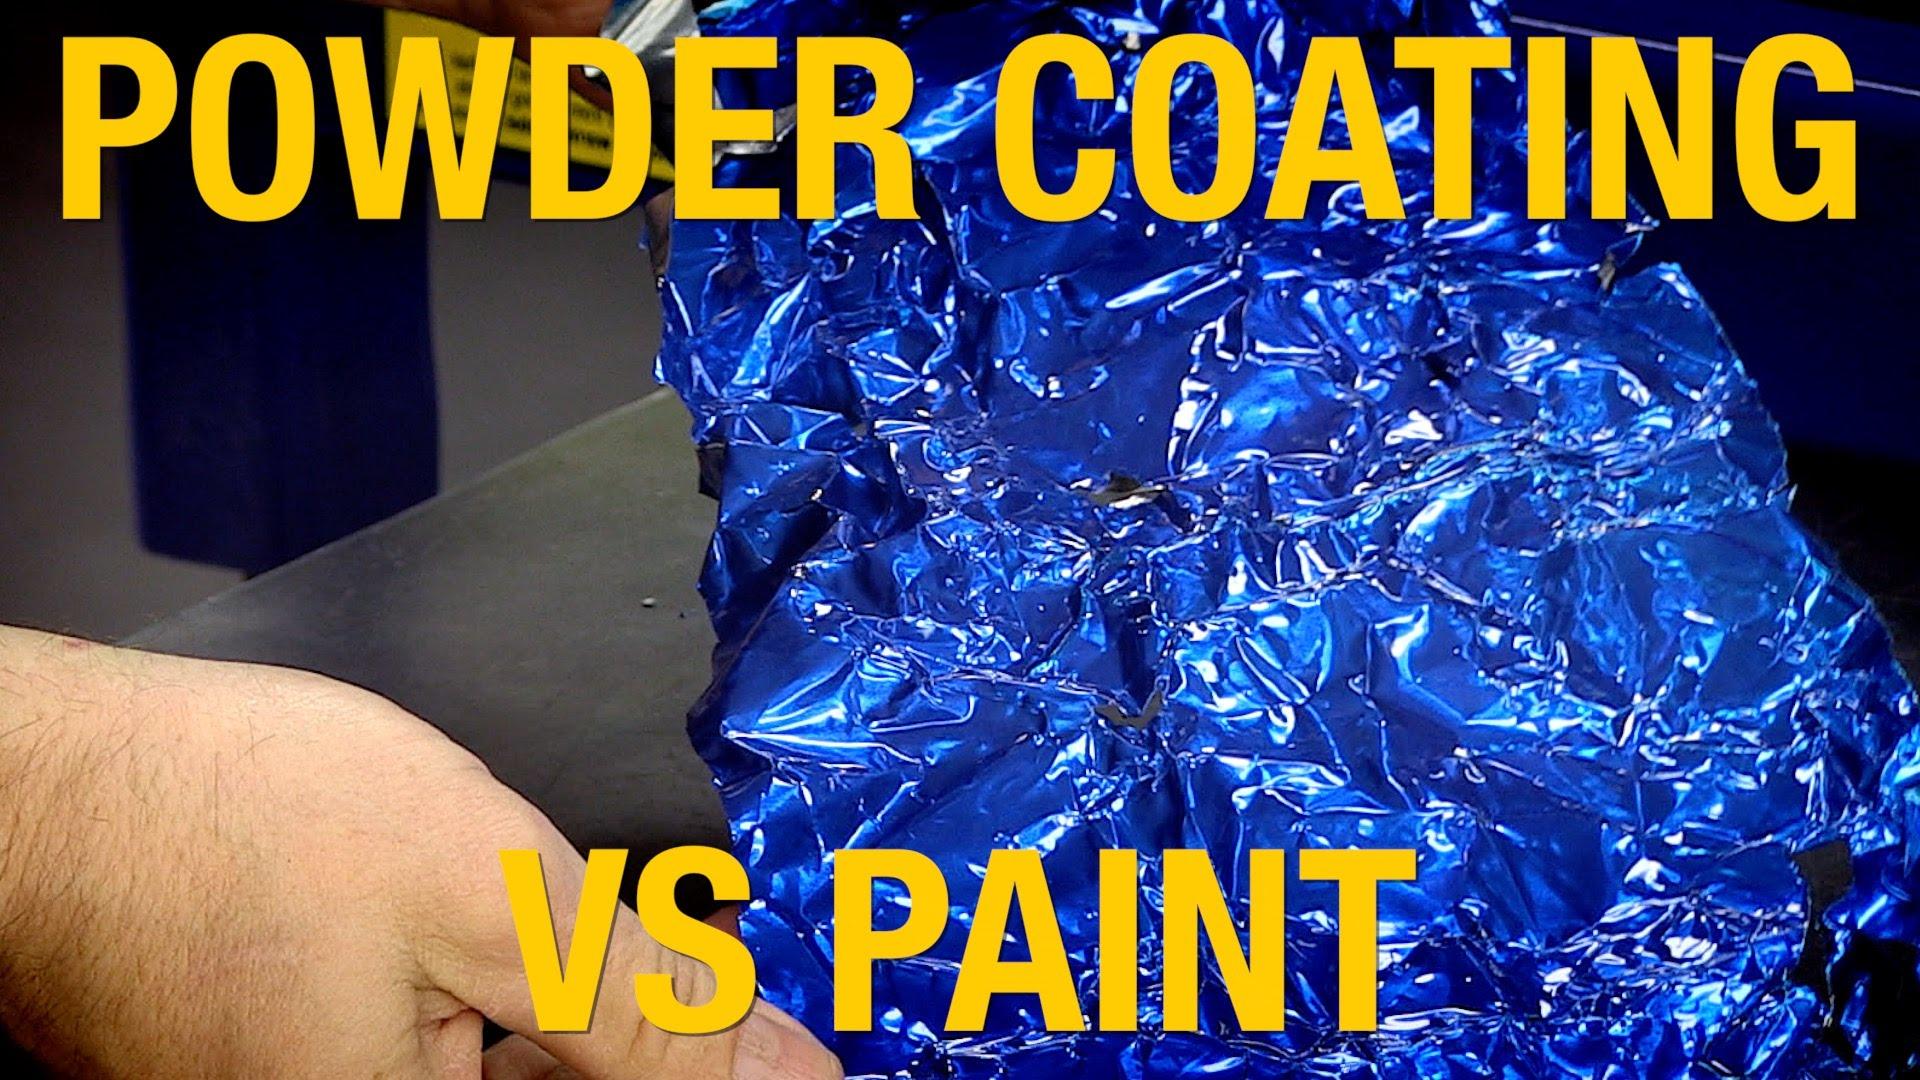 Powder Coat vs Paint